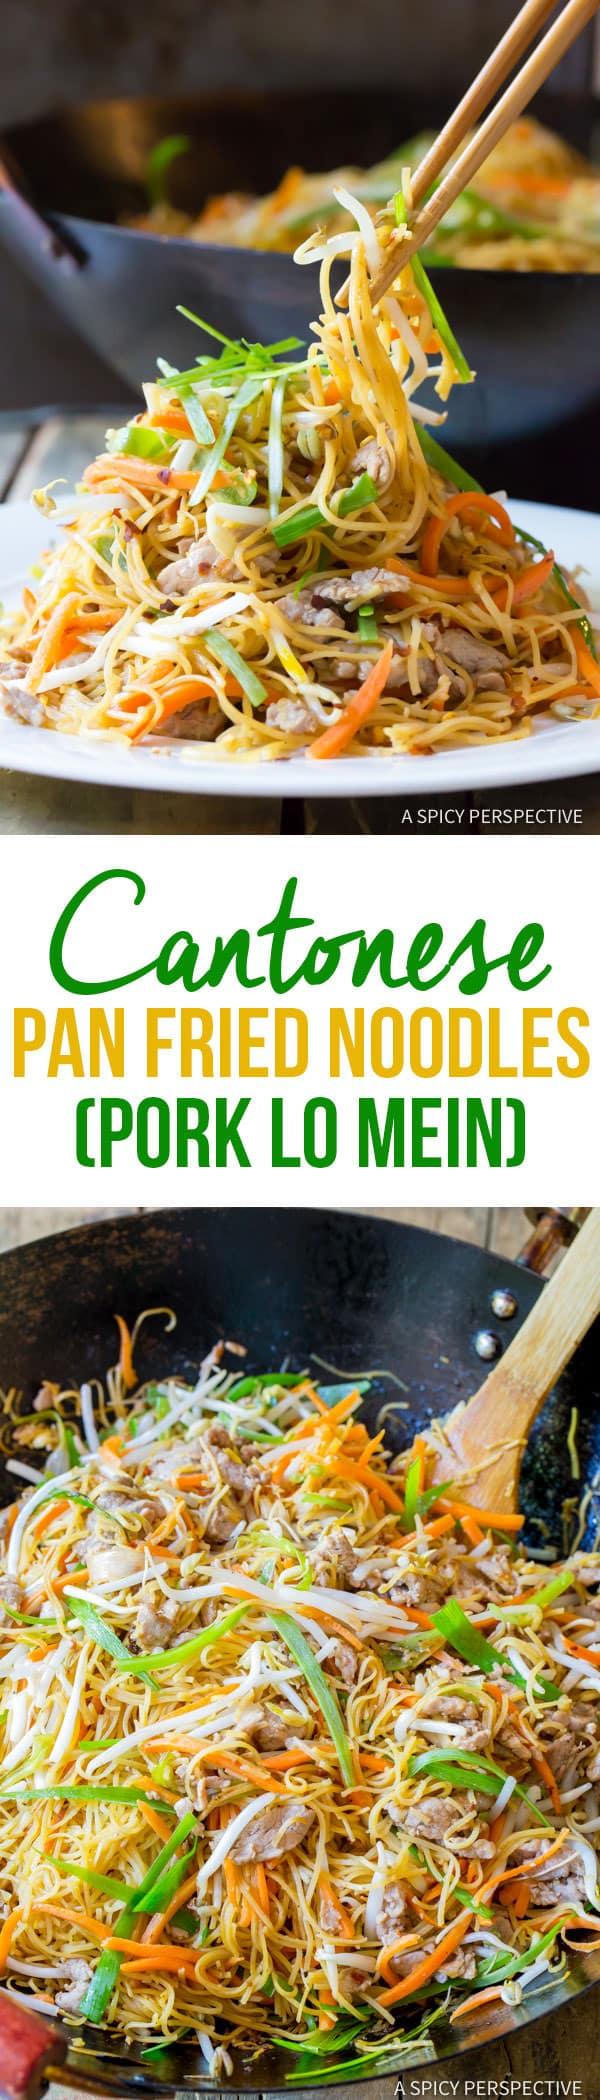 Steaming Cantonese Pan Fried Noodles (Pork Lo Mein) | ASpicyPerspective.com